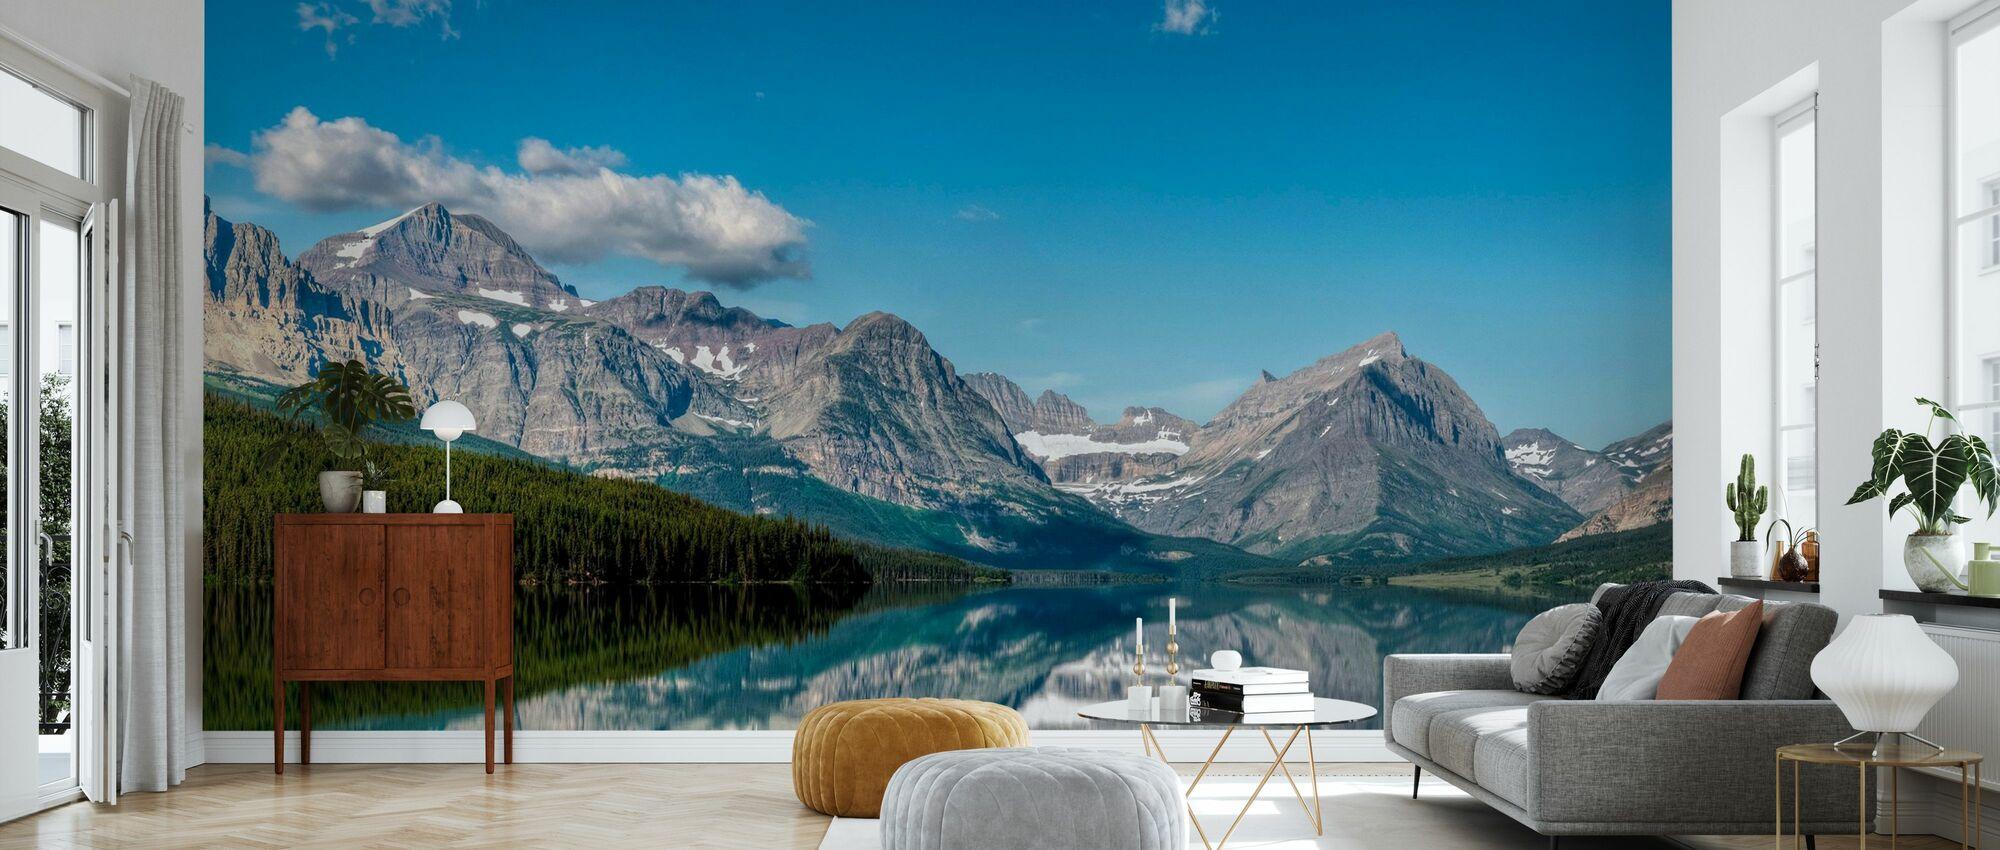 Reflection - Wallpaper - Living Room